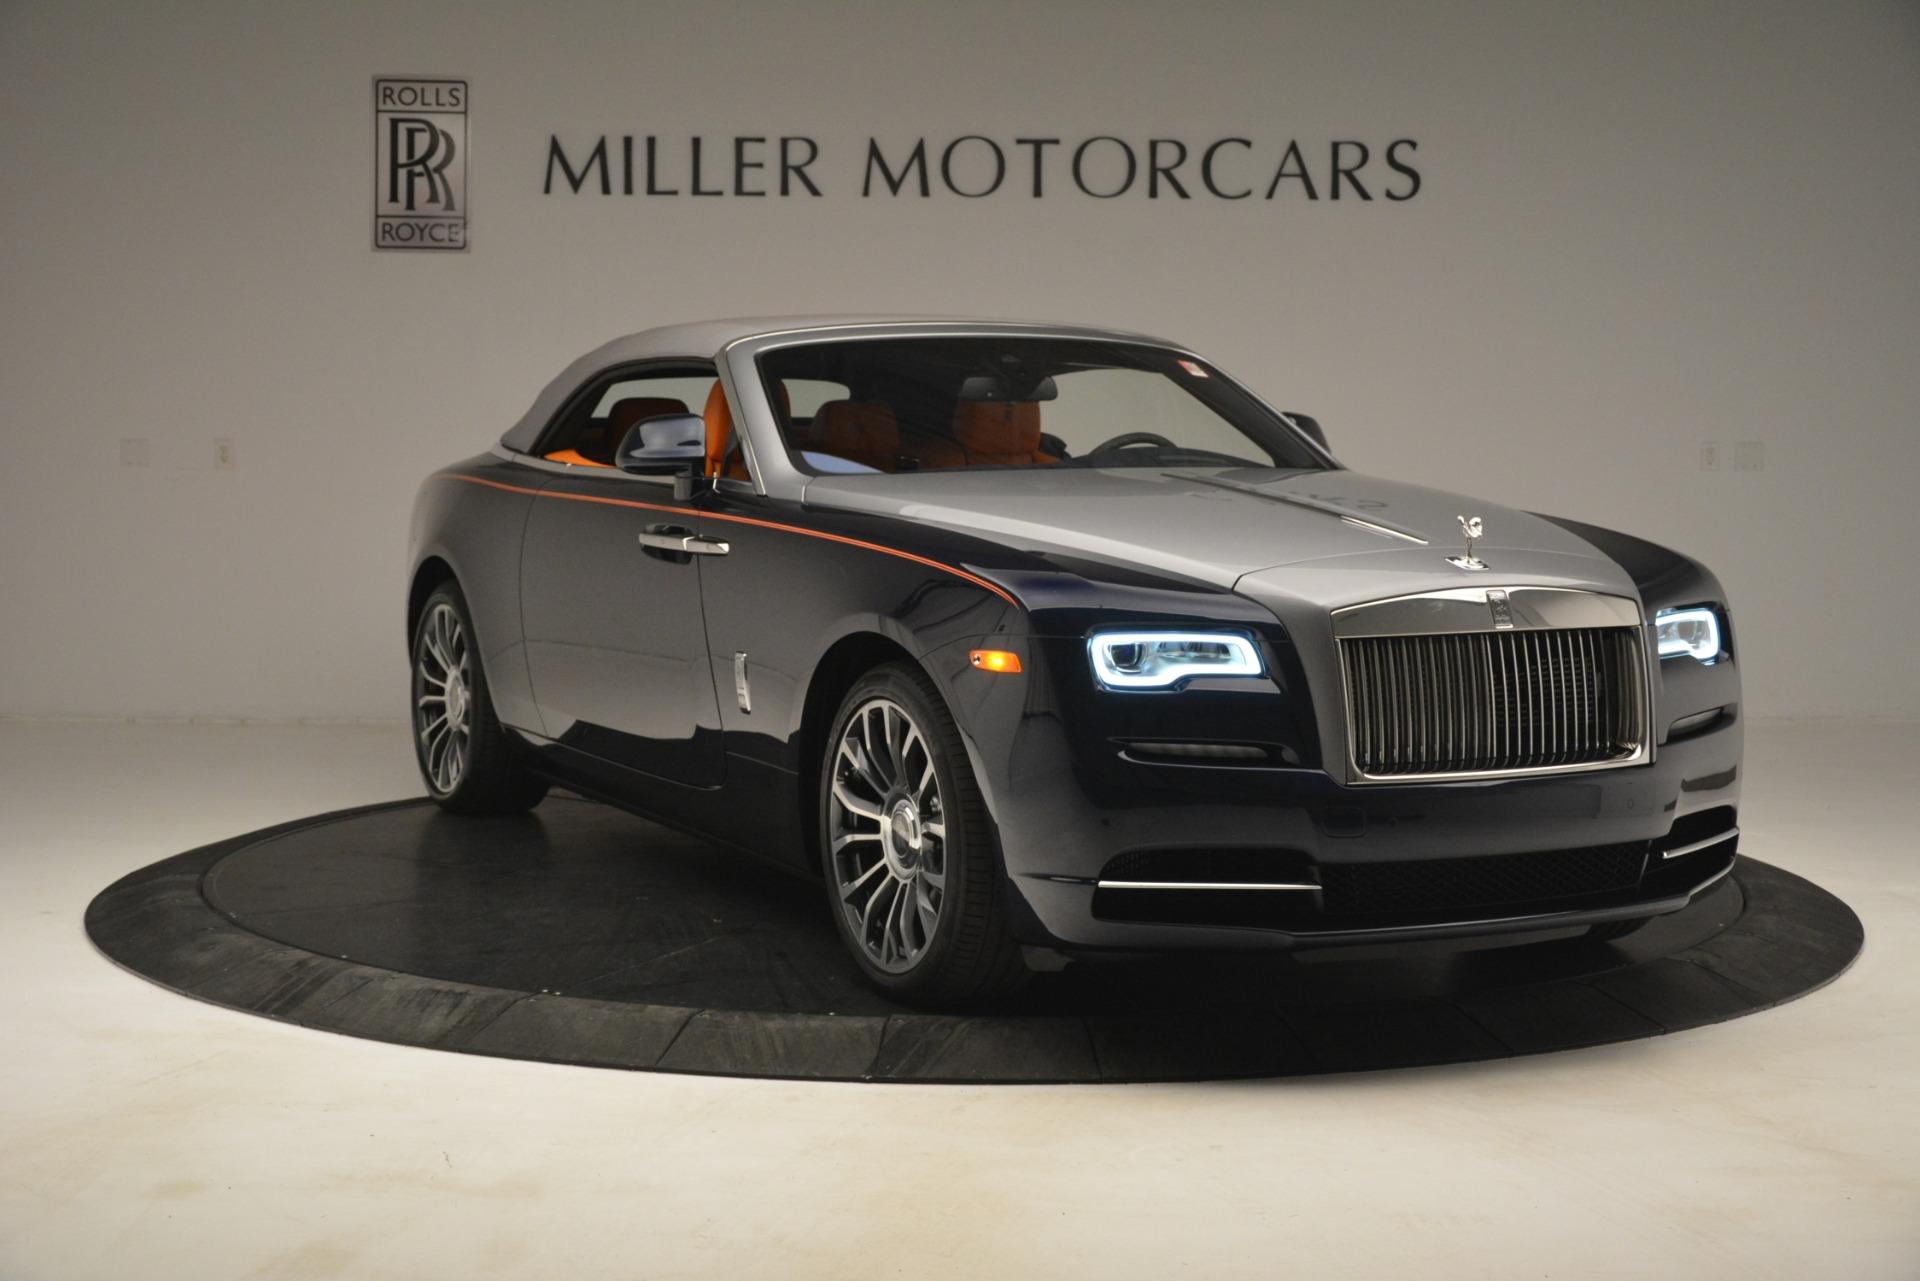 New 2019 Rolls-Royce Dawn  For Sale In Greenwich, CT 2701_p47